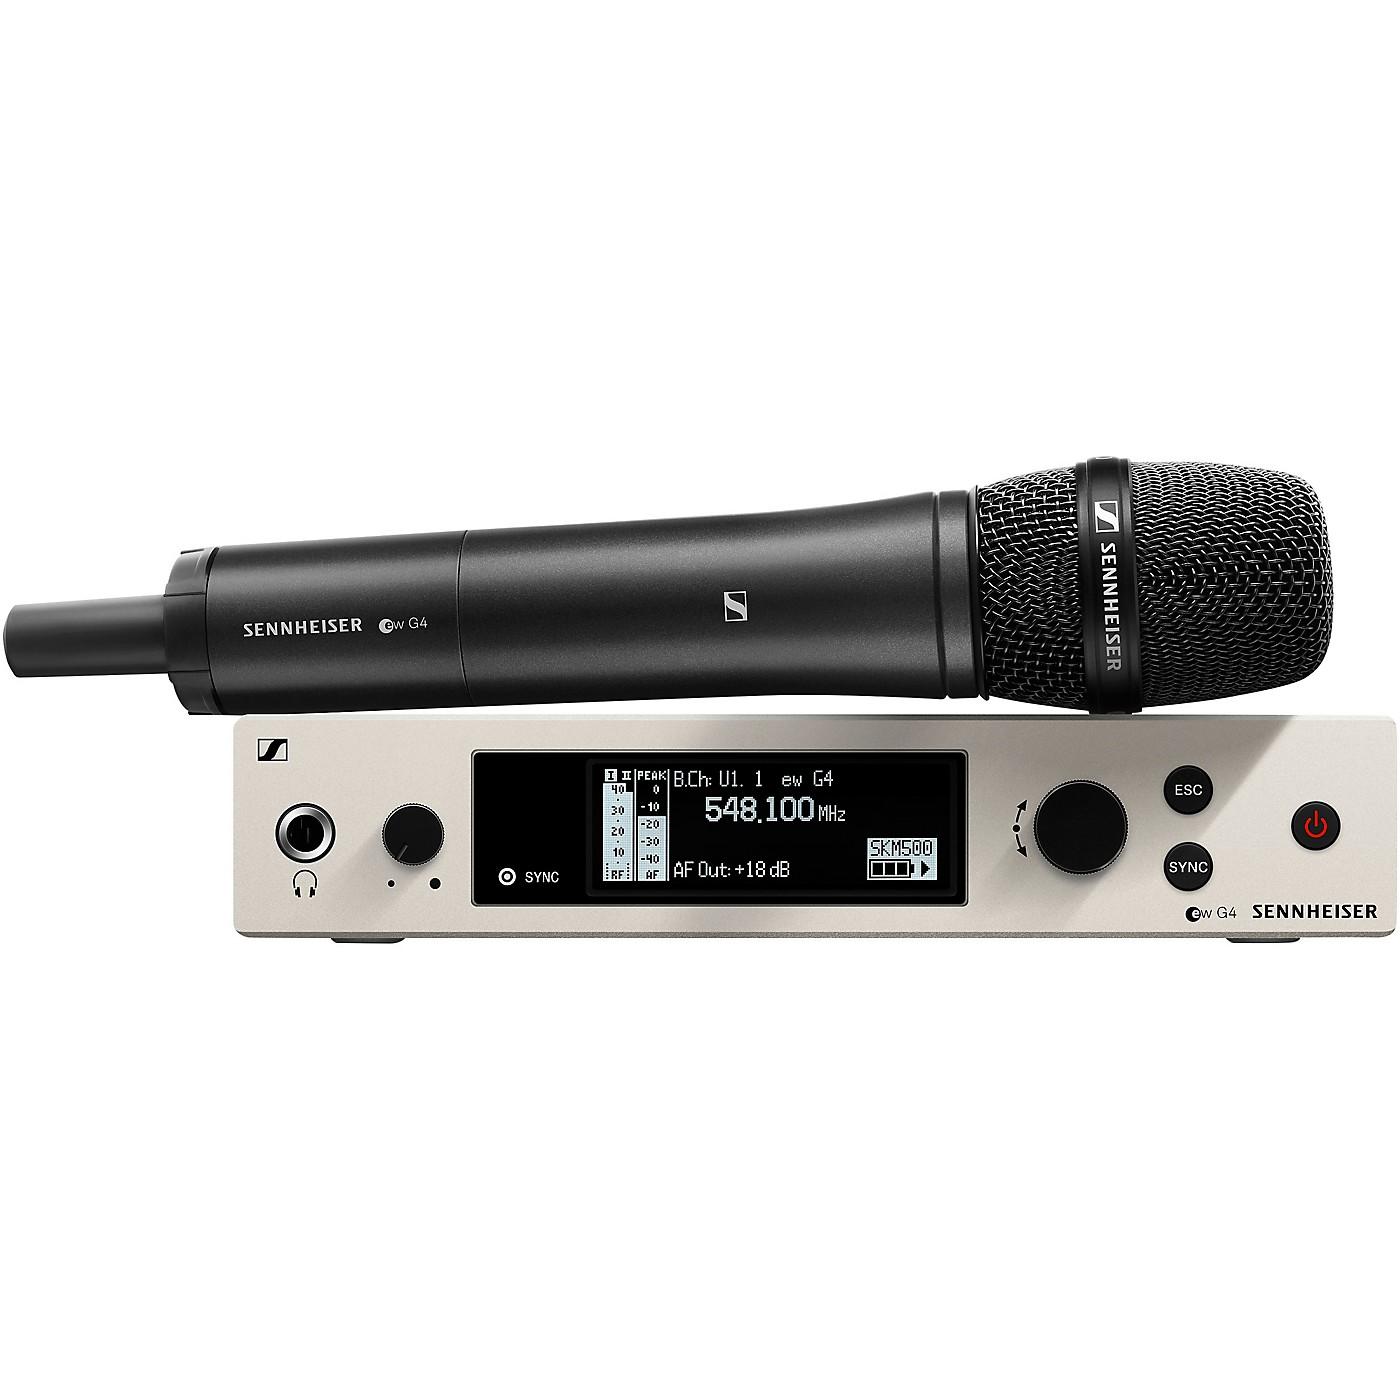 Sennheiser EW 500 G4-965 Wireless Handheld Microphone System thumbnail